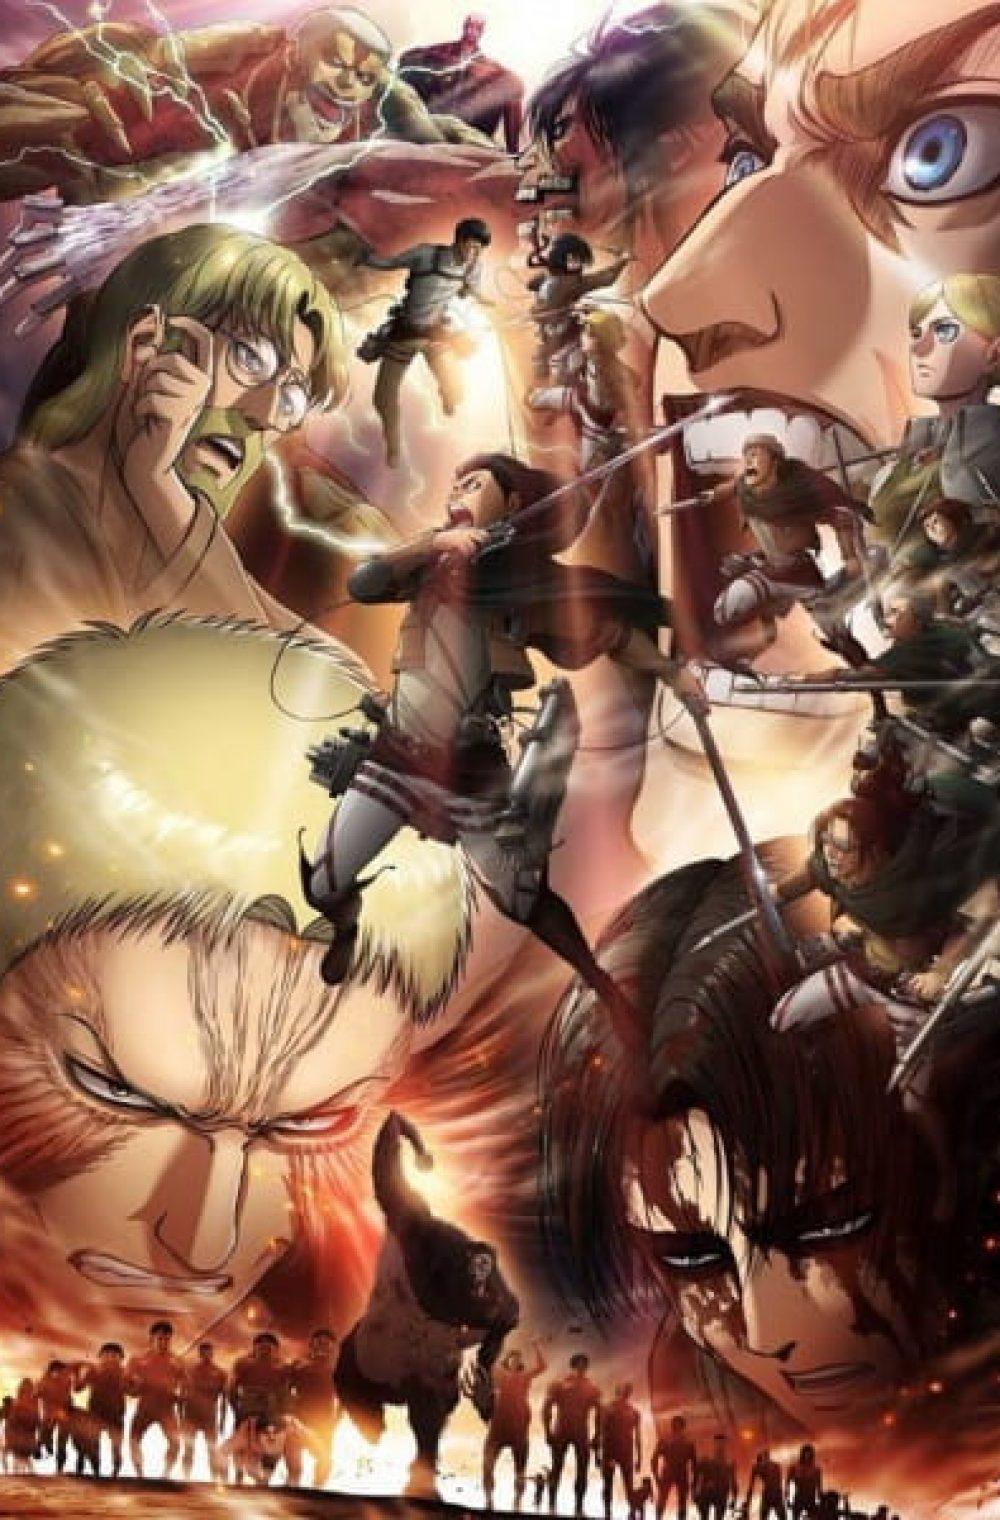 Shingeki no Kyojin 3 Part 2 ( Attack on Titan Season 3 Part 2 )